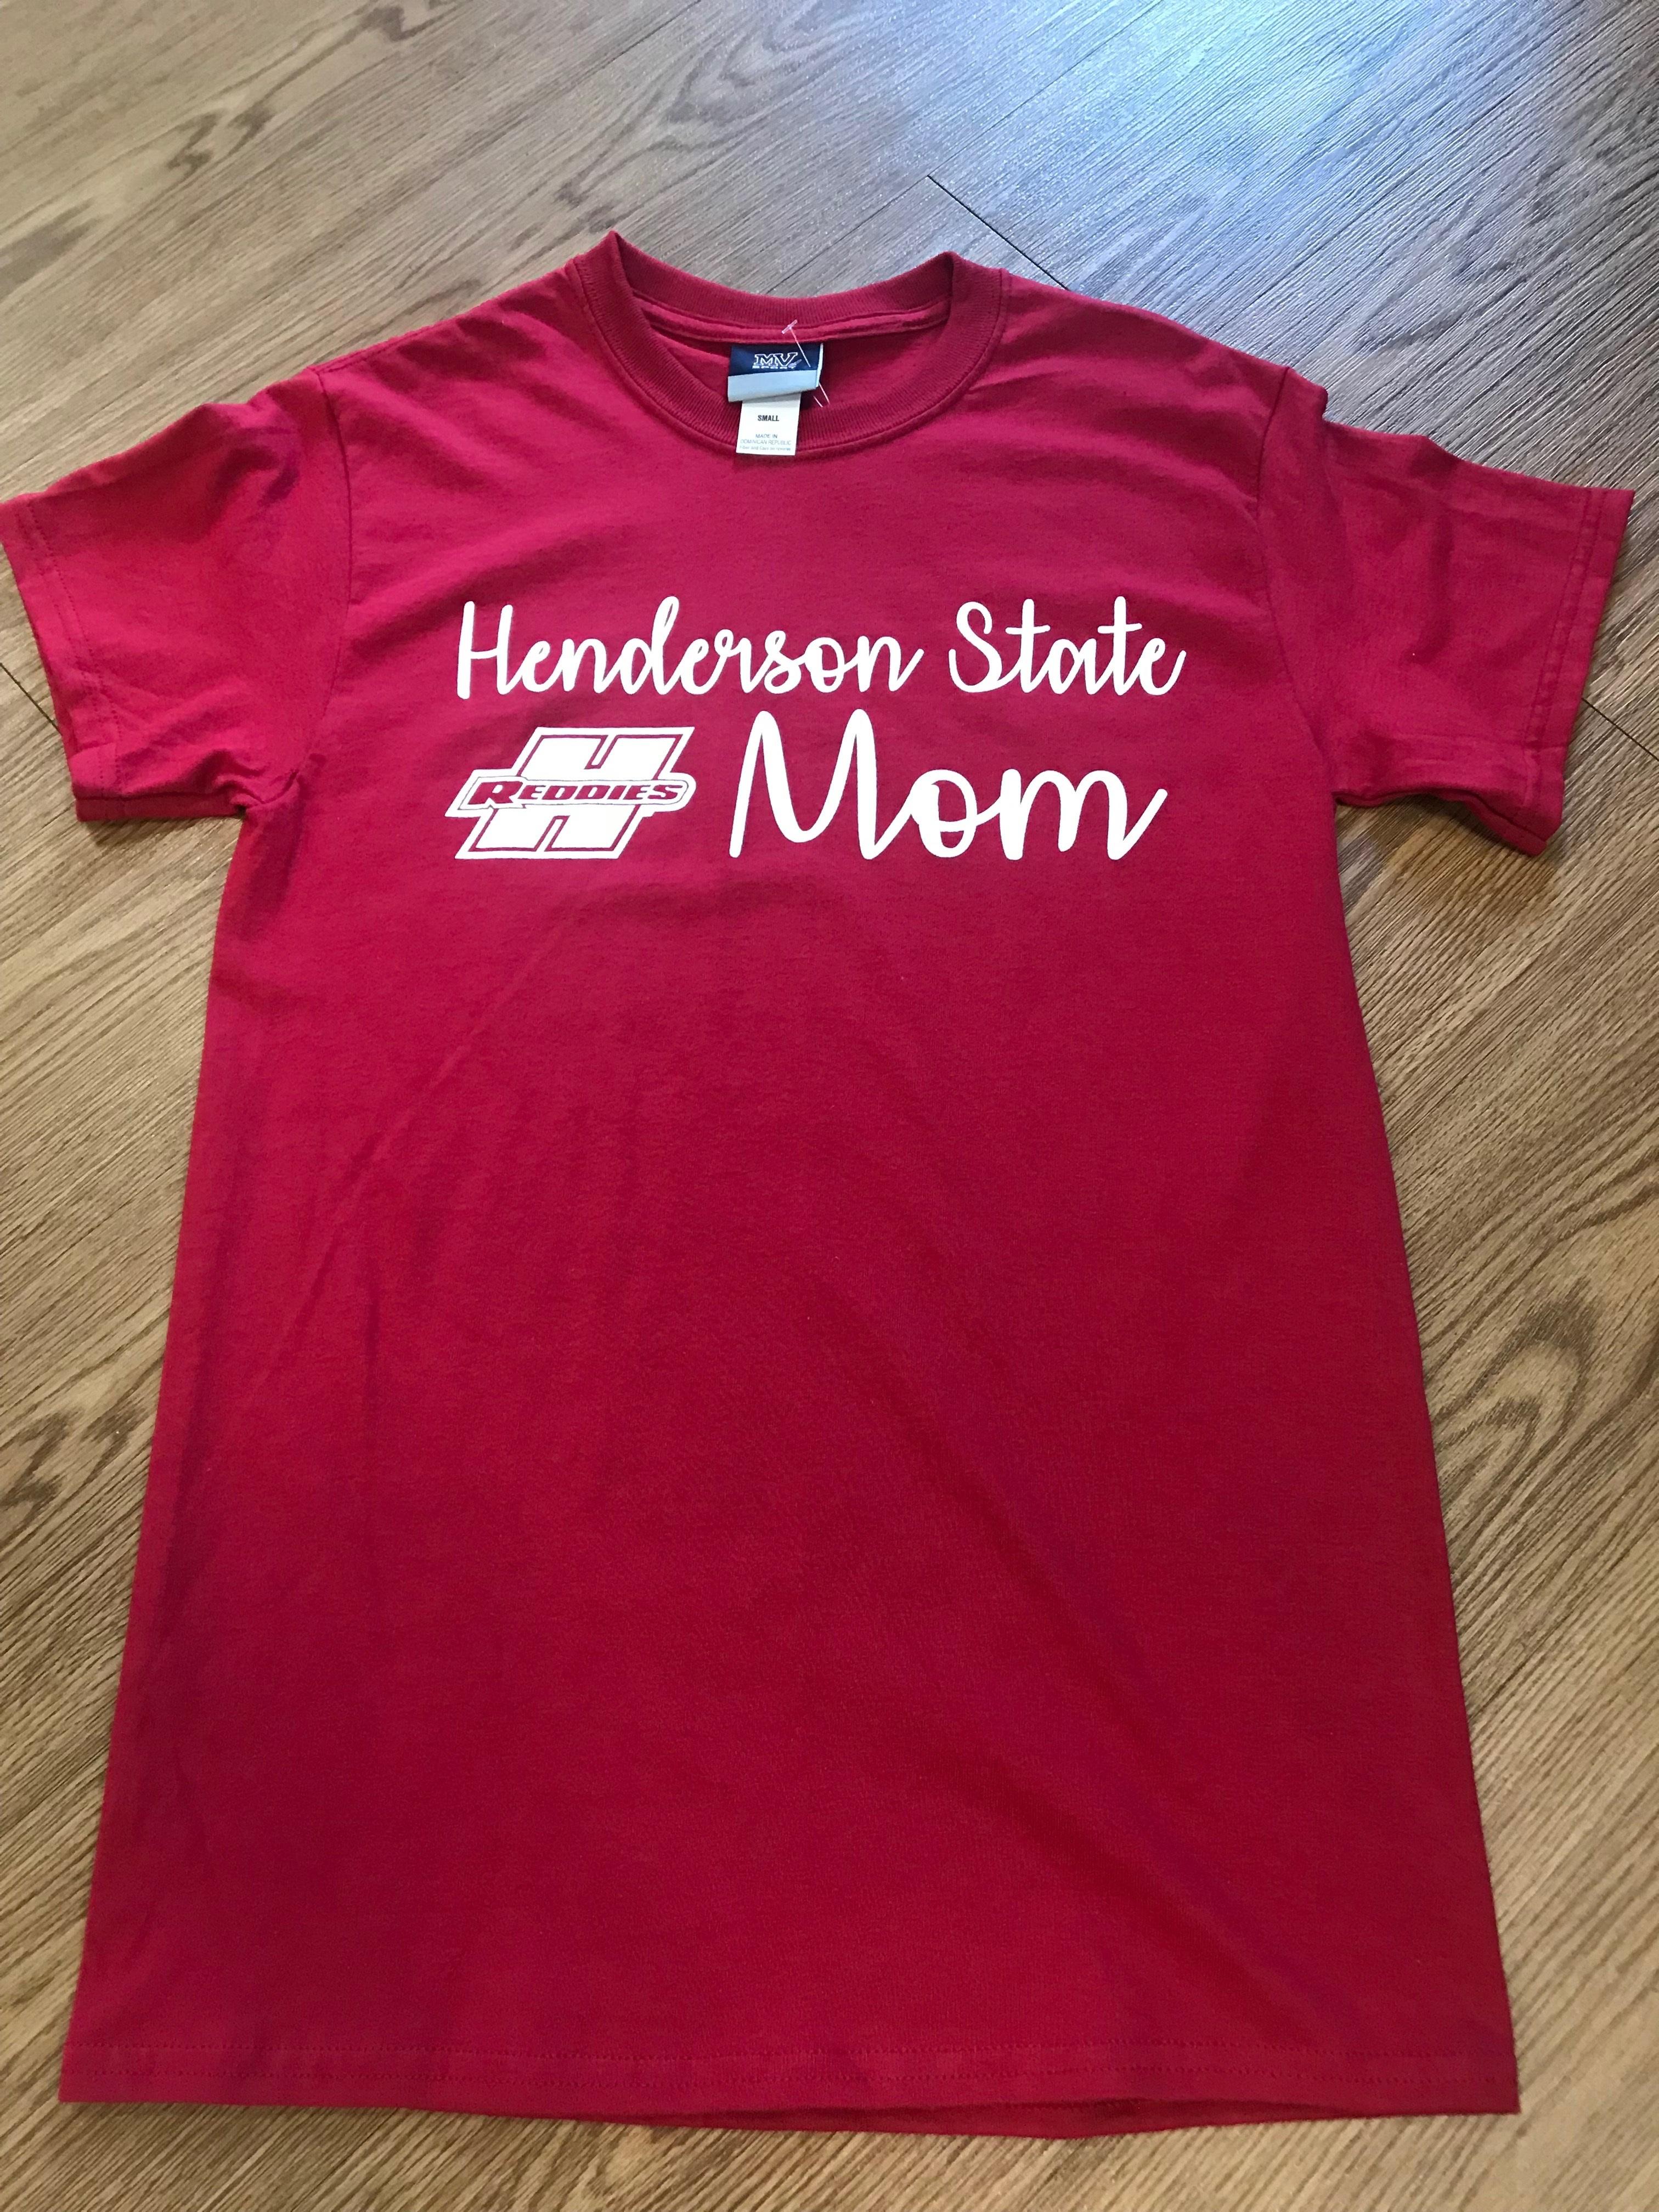 HENDERSON STATE MOM TEE